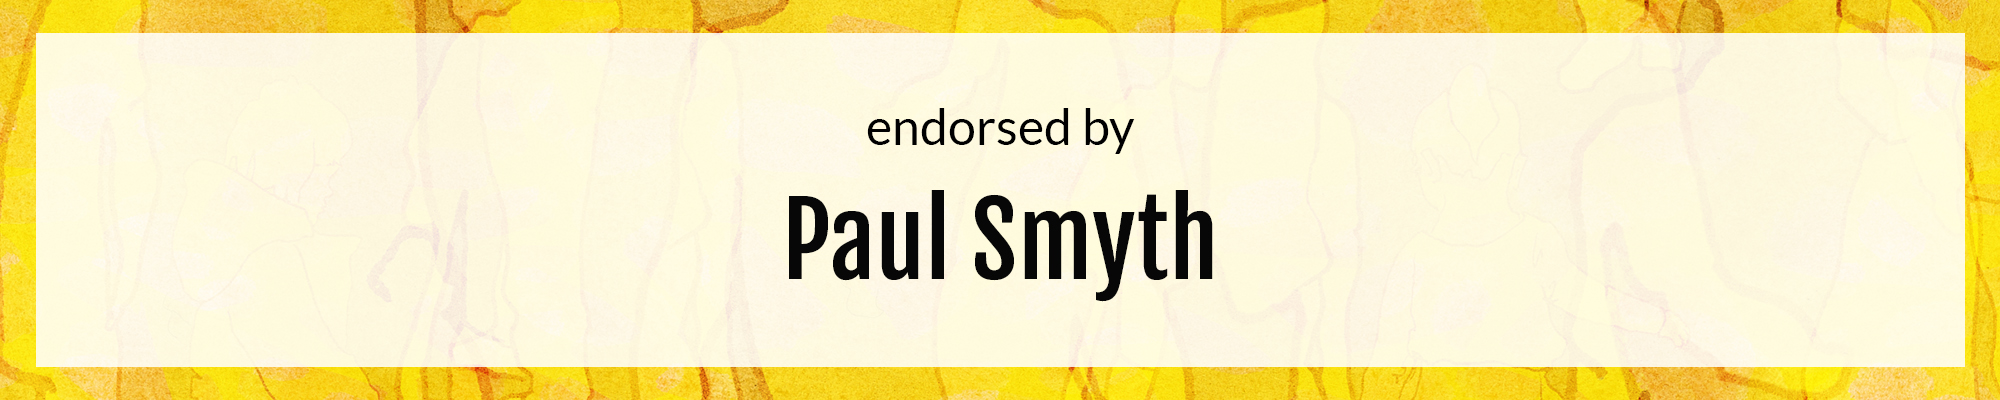 Paul Smyth.jpg